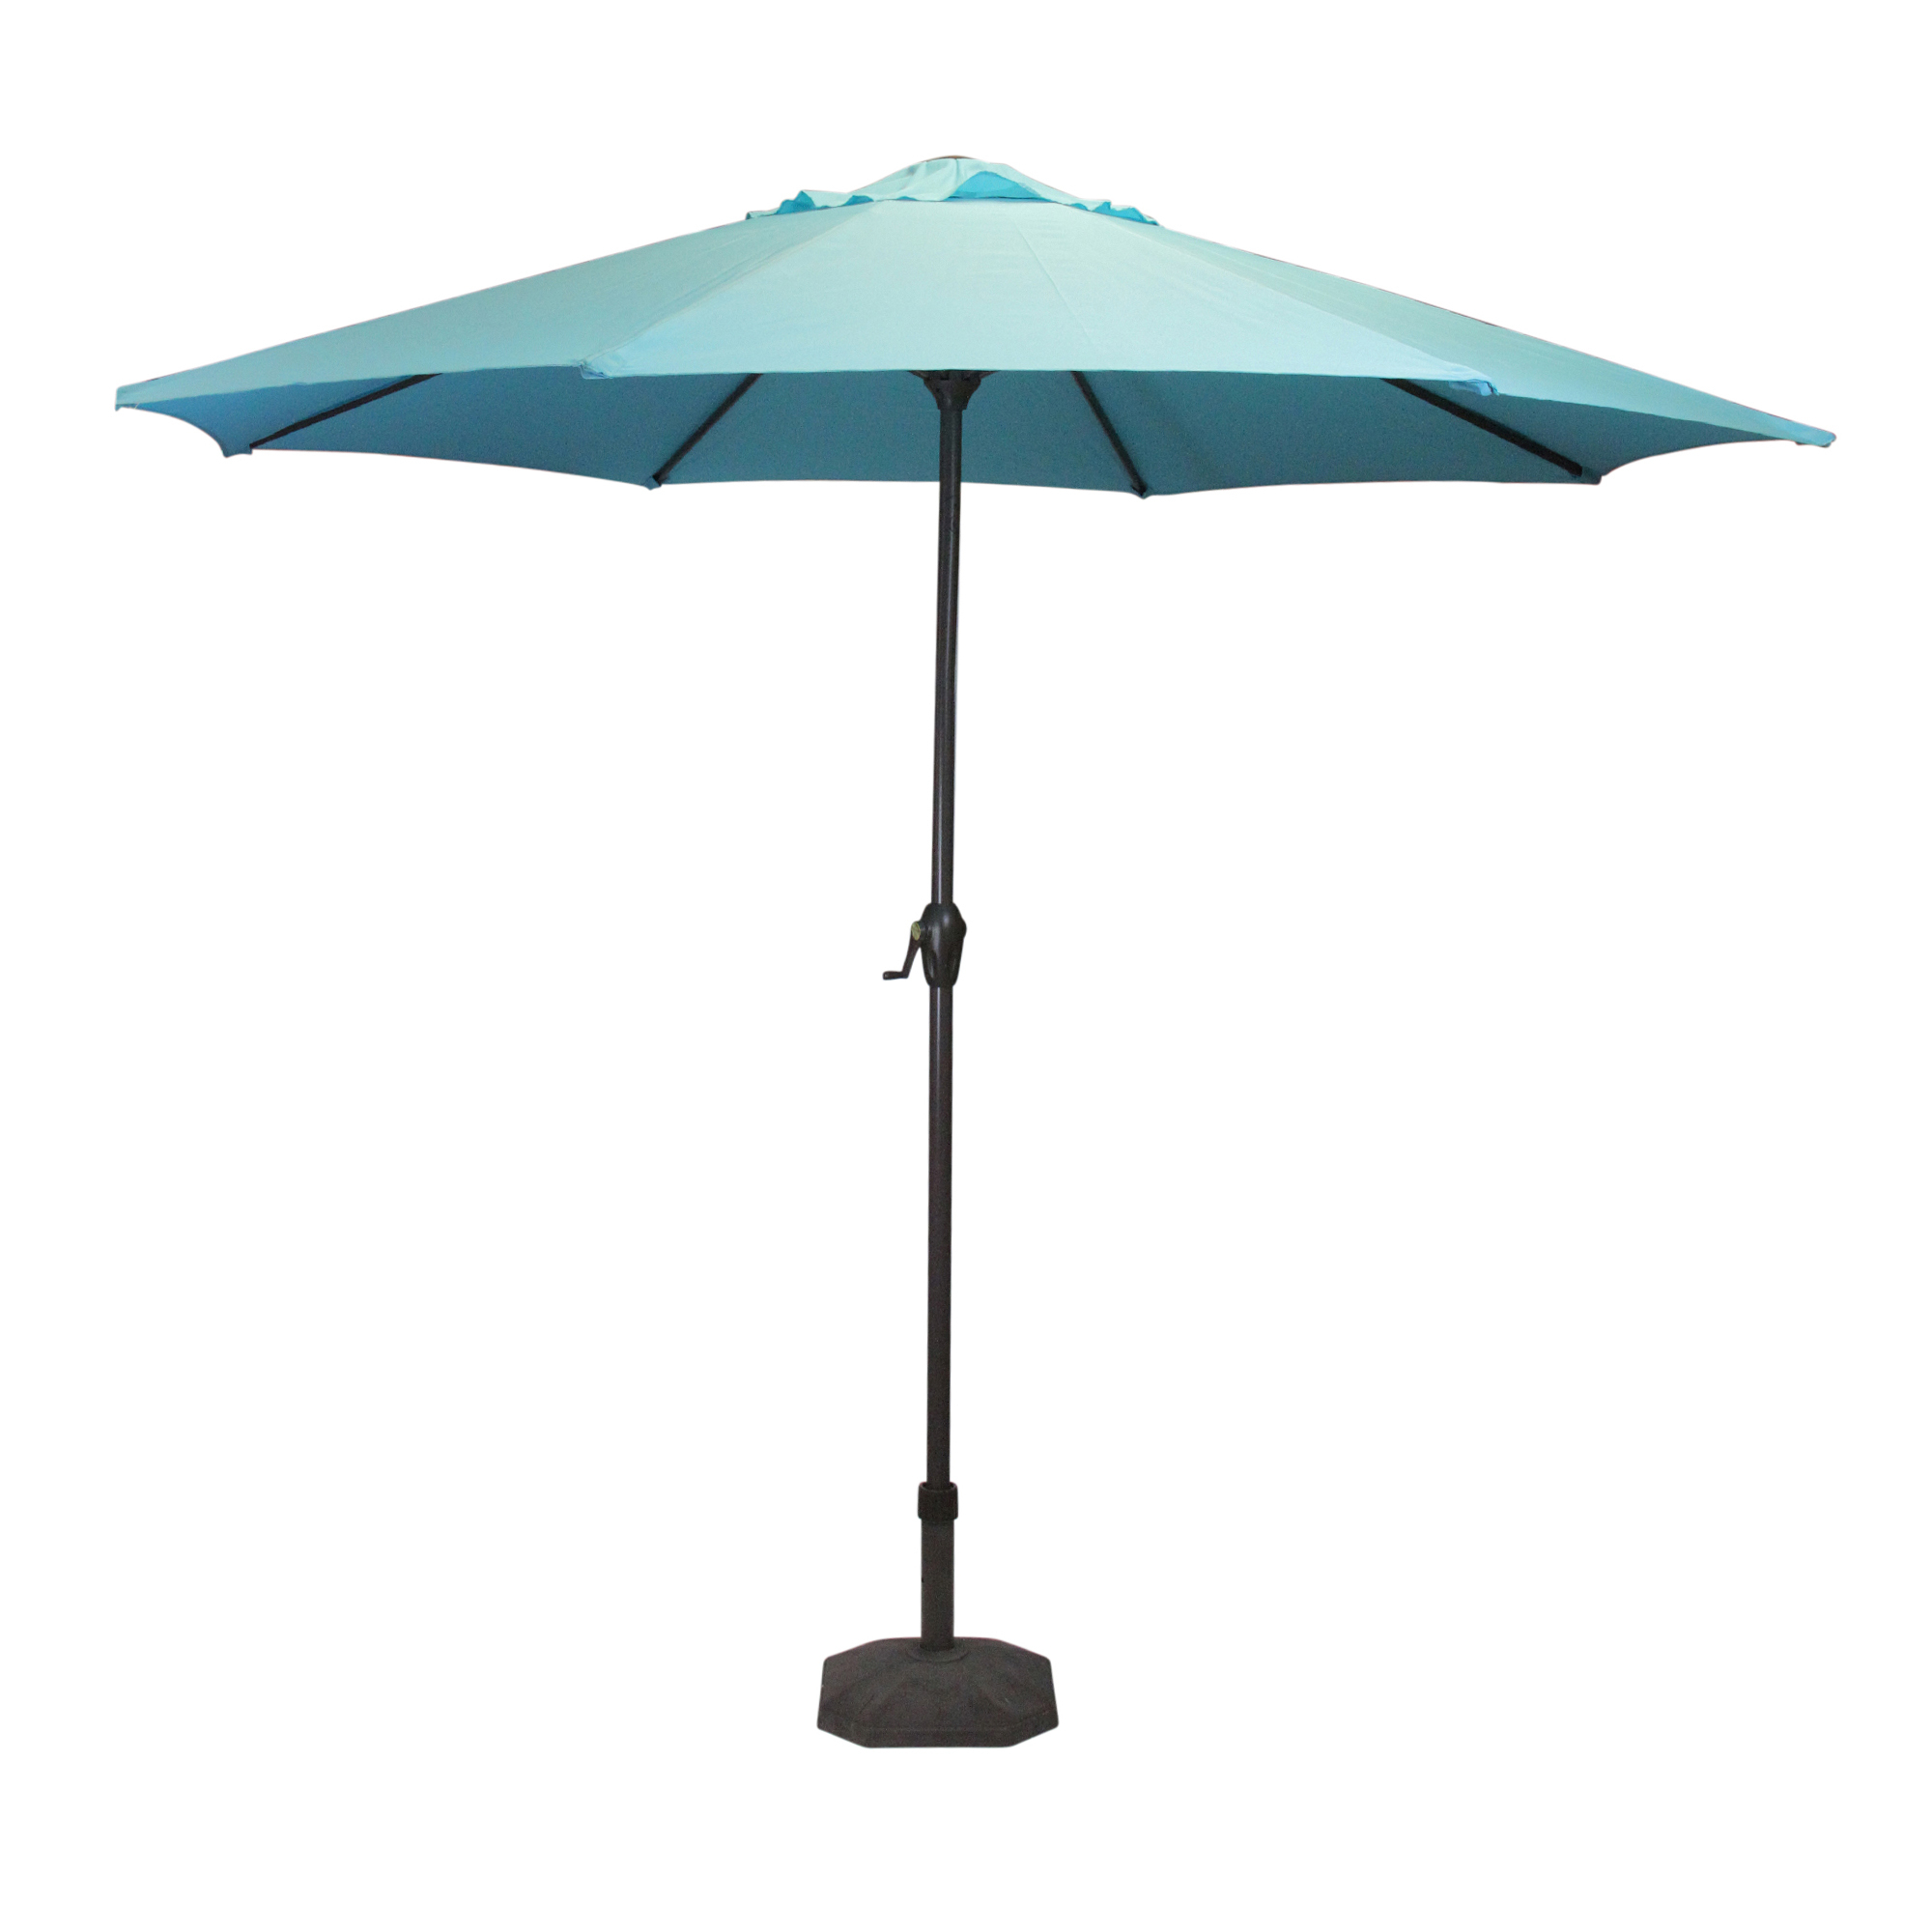 2019 Lb International 8' Octagon Solid Outdoor Patio Market Umbrella With Hand Crank And Tilt – Blue/brown Regarding Solid Market Umbrellas (Gallery 1 of 20)